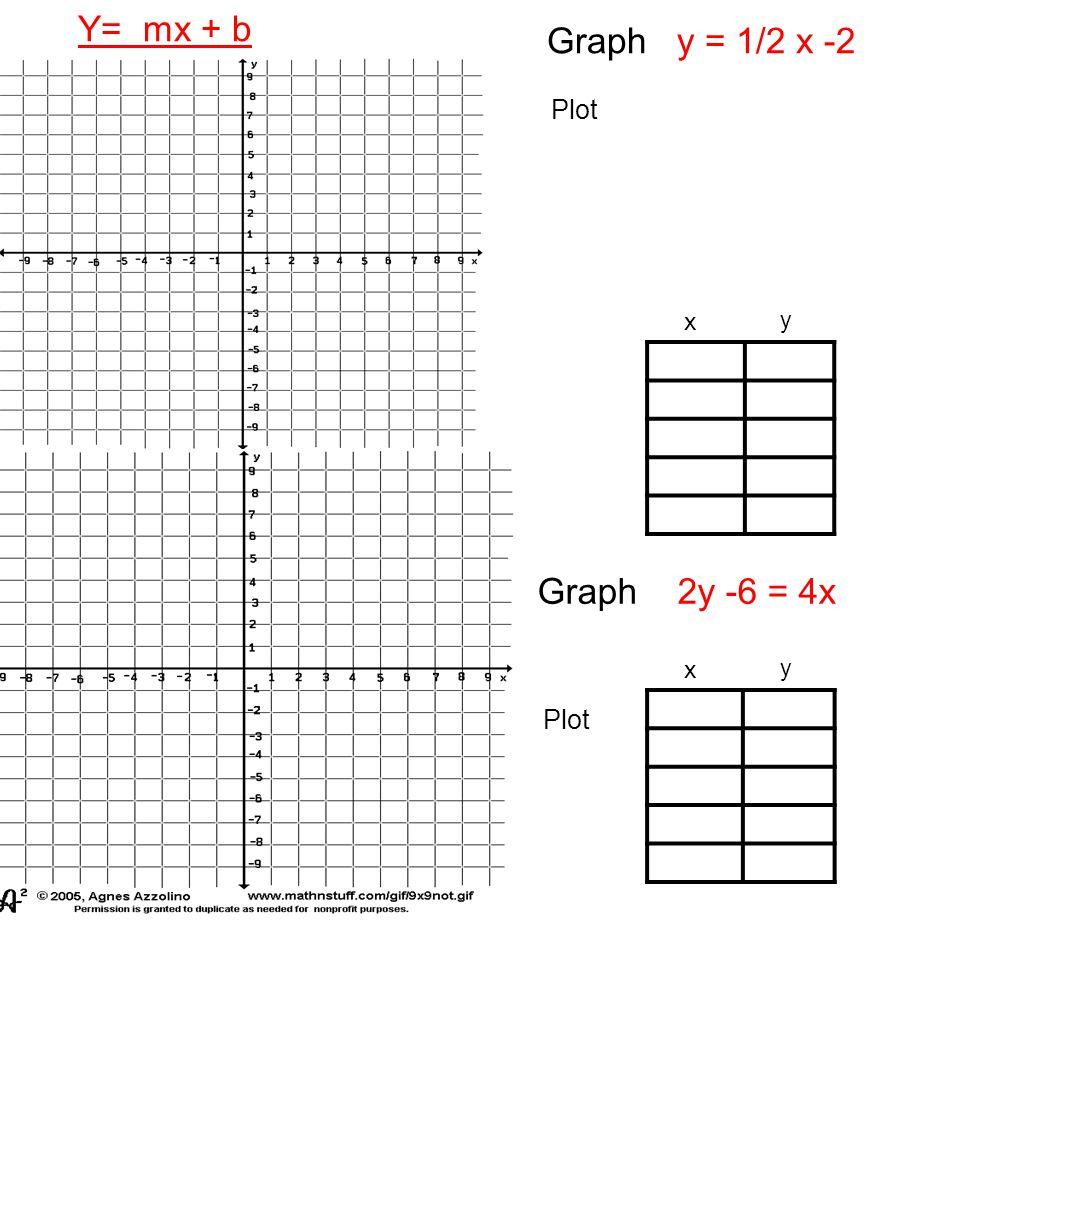 Y= mx + b Graph y = 1/2 x -2 Plot x y Graph 2y -6 = 4x x y Plot